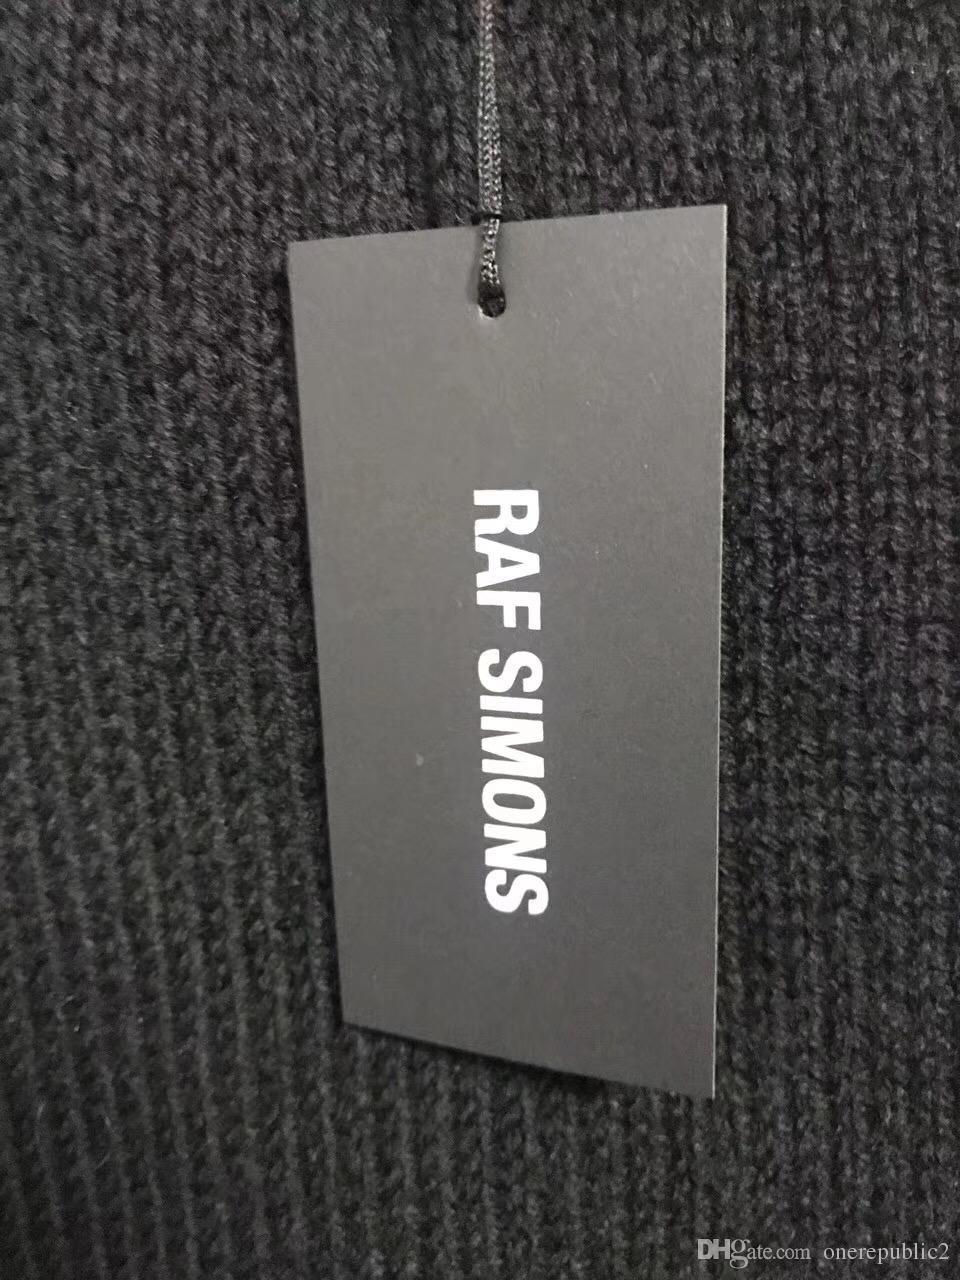 2018 nuevos Raf simons Suéter de gran tamaño sudaderas con capucha Hombres Mujeres Unisexual Pocket Knit Shirt Moda Negro Manga Larga Envío Gratis 888